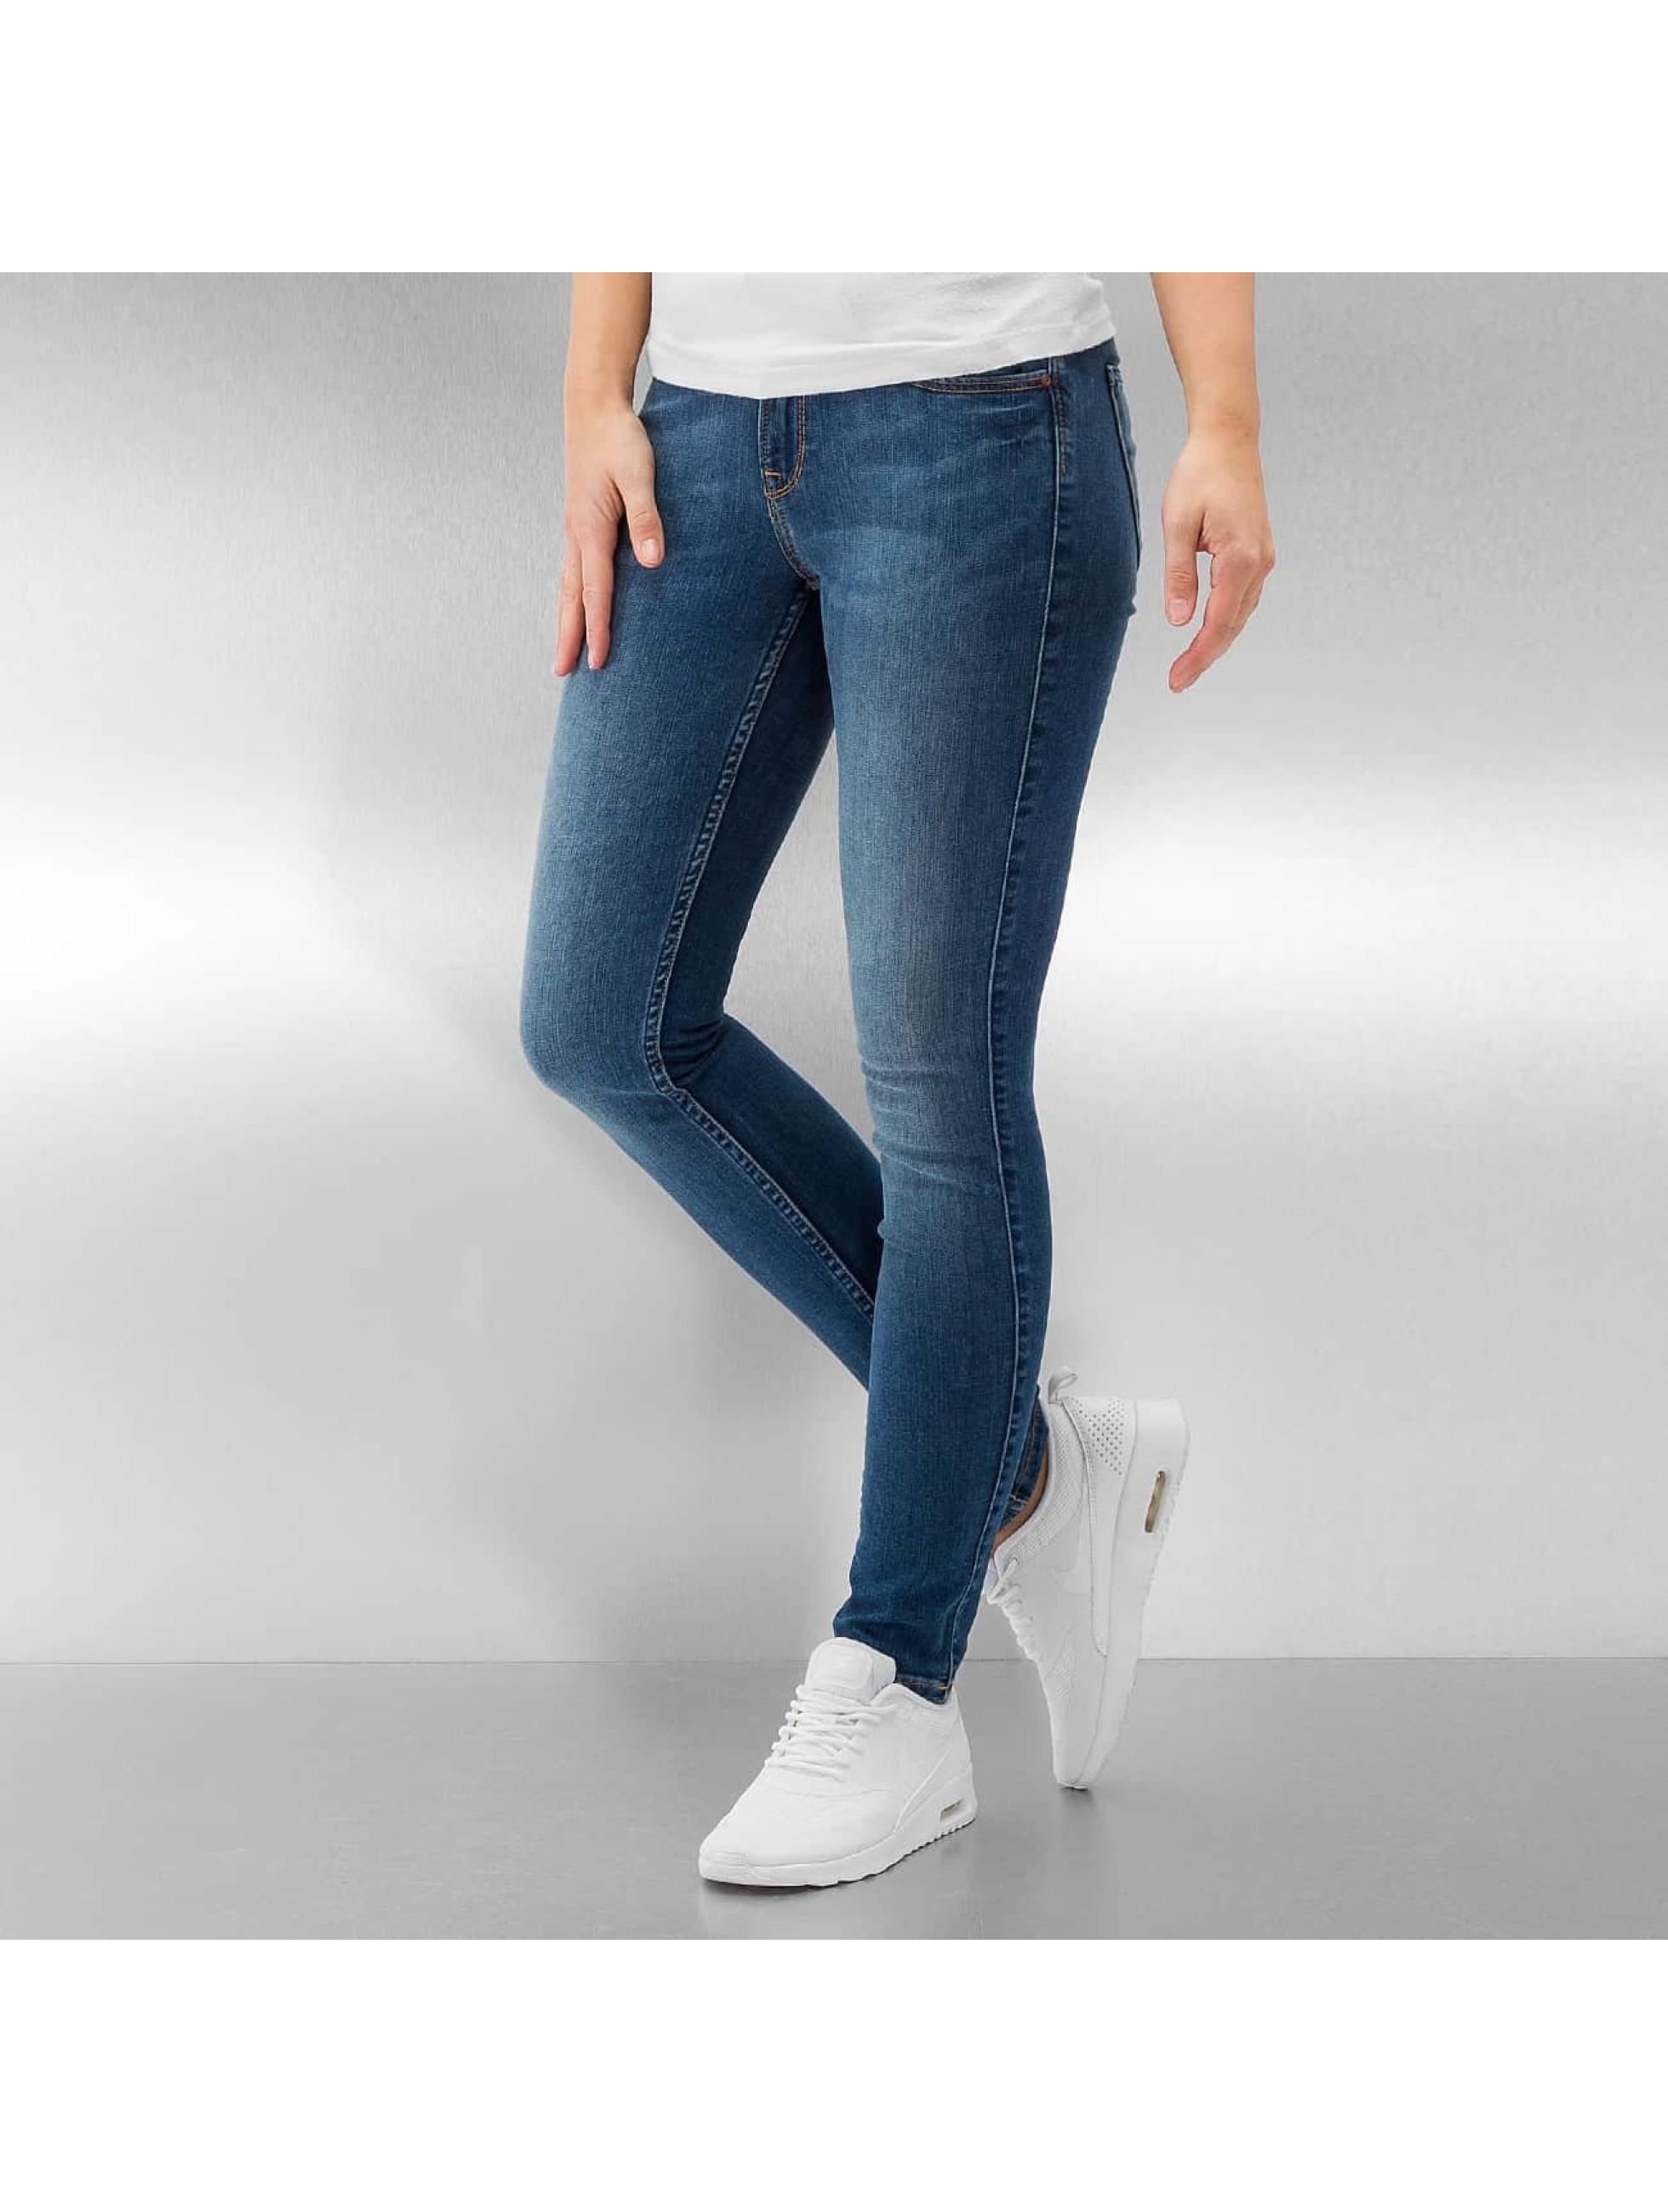 lee damen jeans skinny jeans jodee ebay. Black Bedroom Furniture Sets. Home Design Ideas